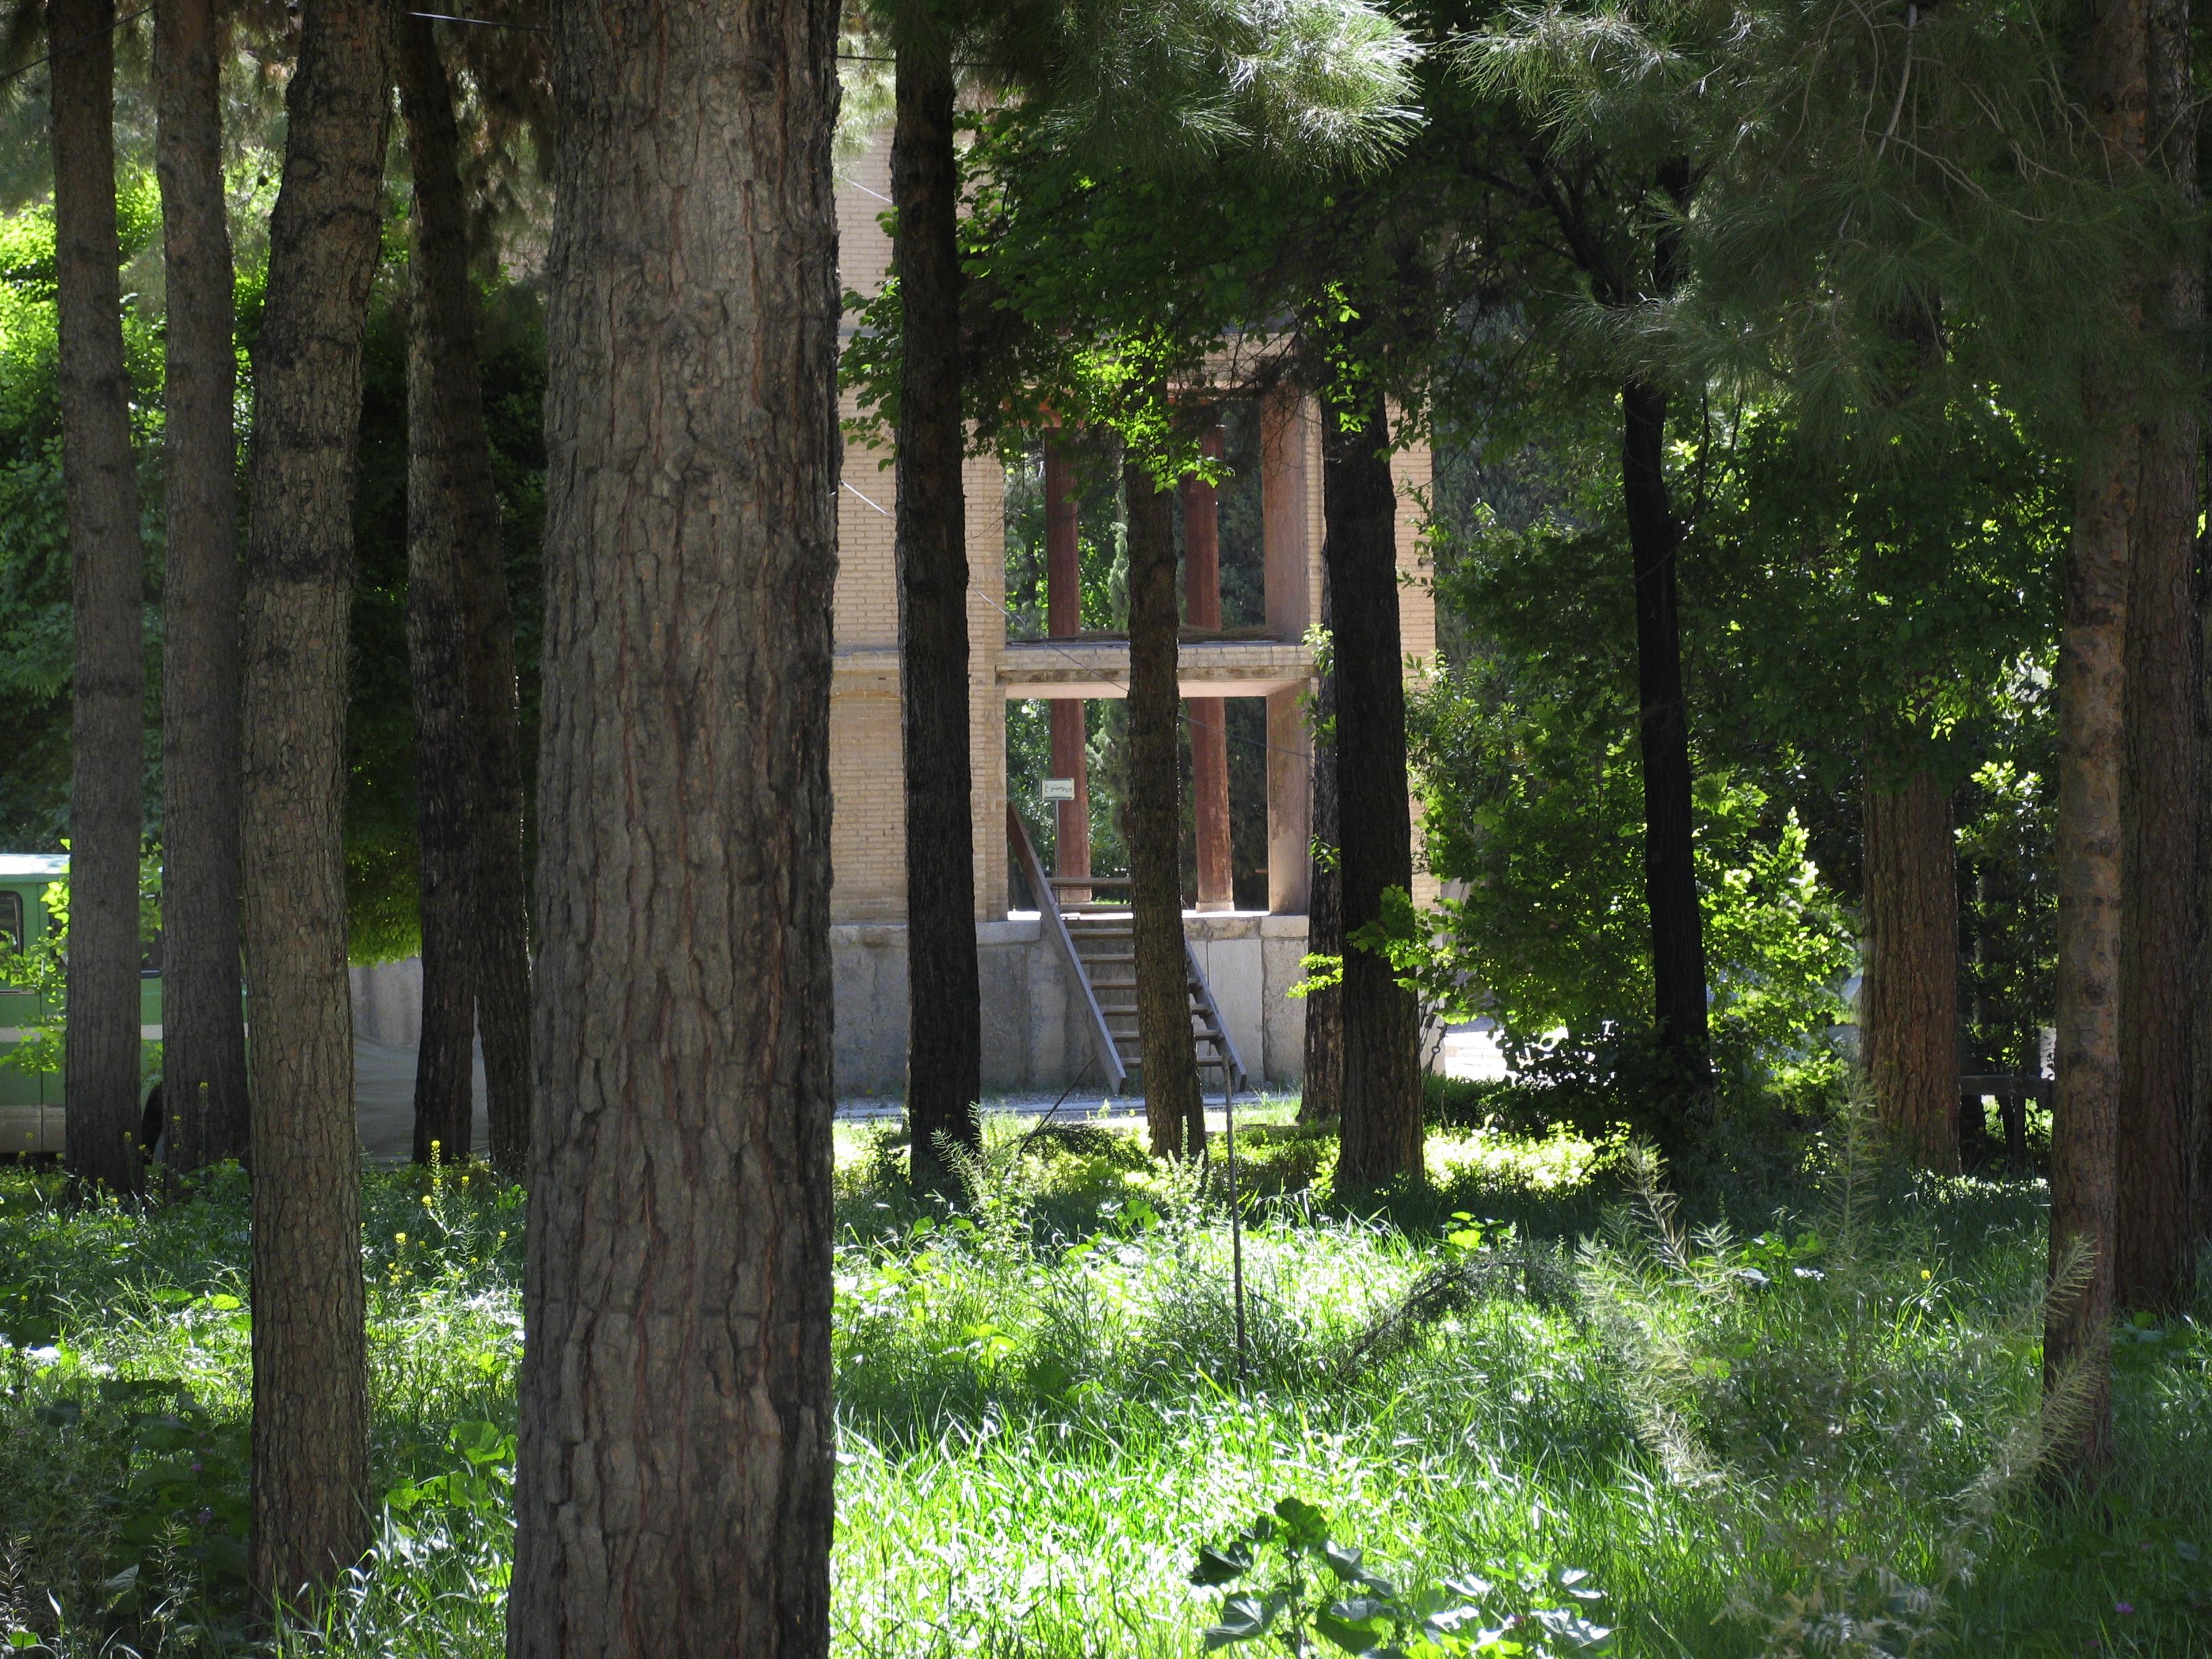 Chehel Sutun Garden